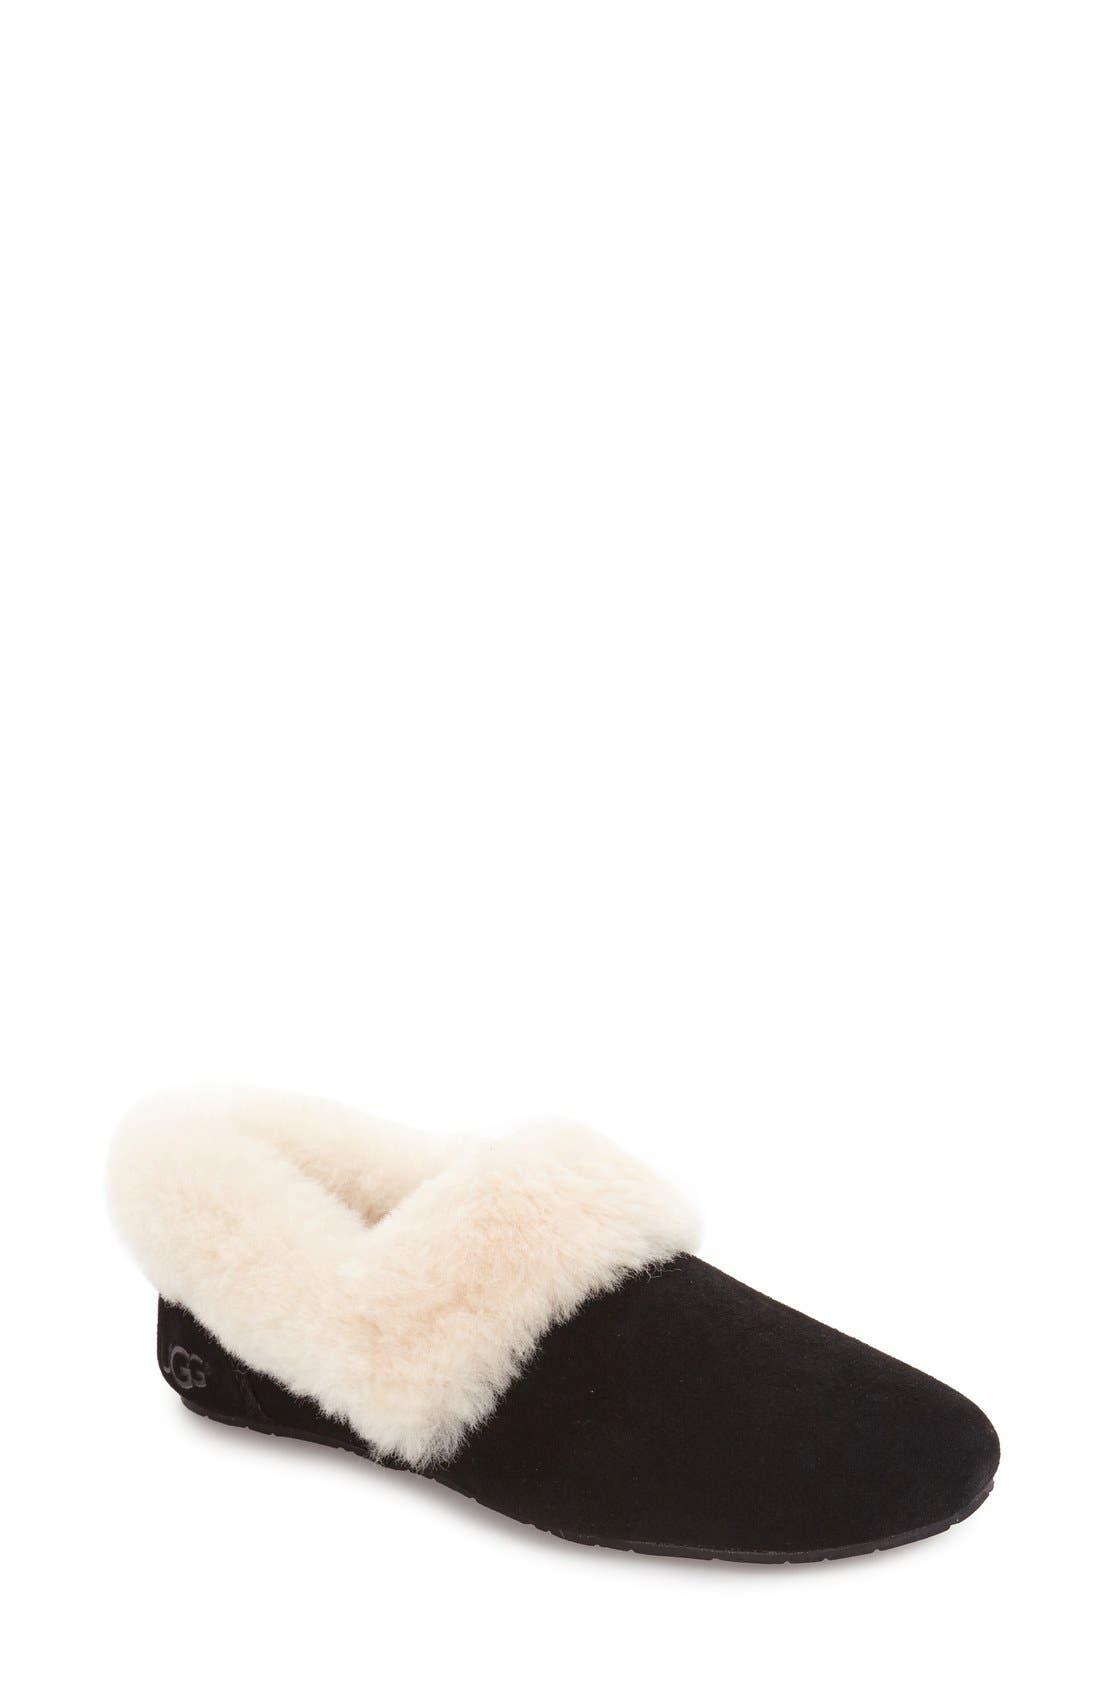 Main Image - UGG® Kendyl Genuine Shearling Slipper (Women)